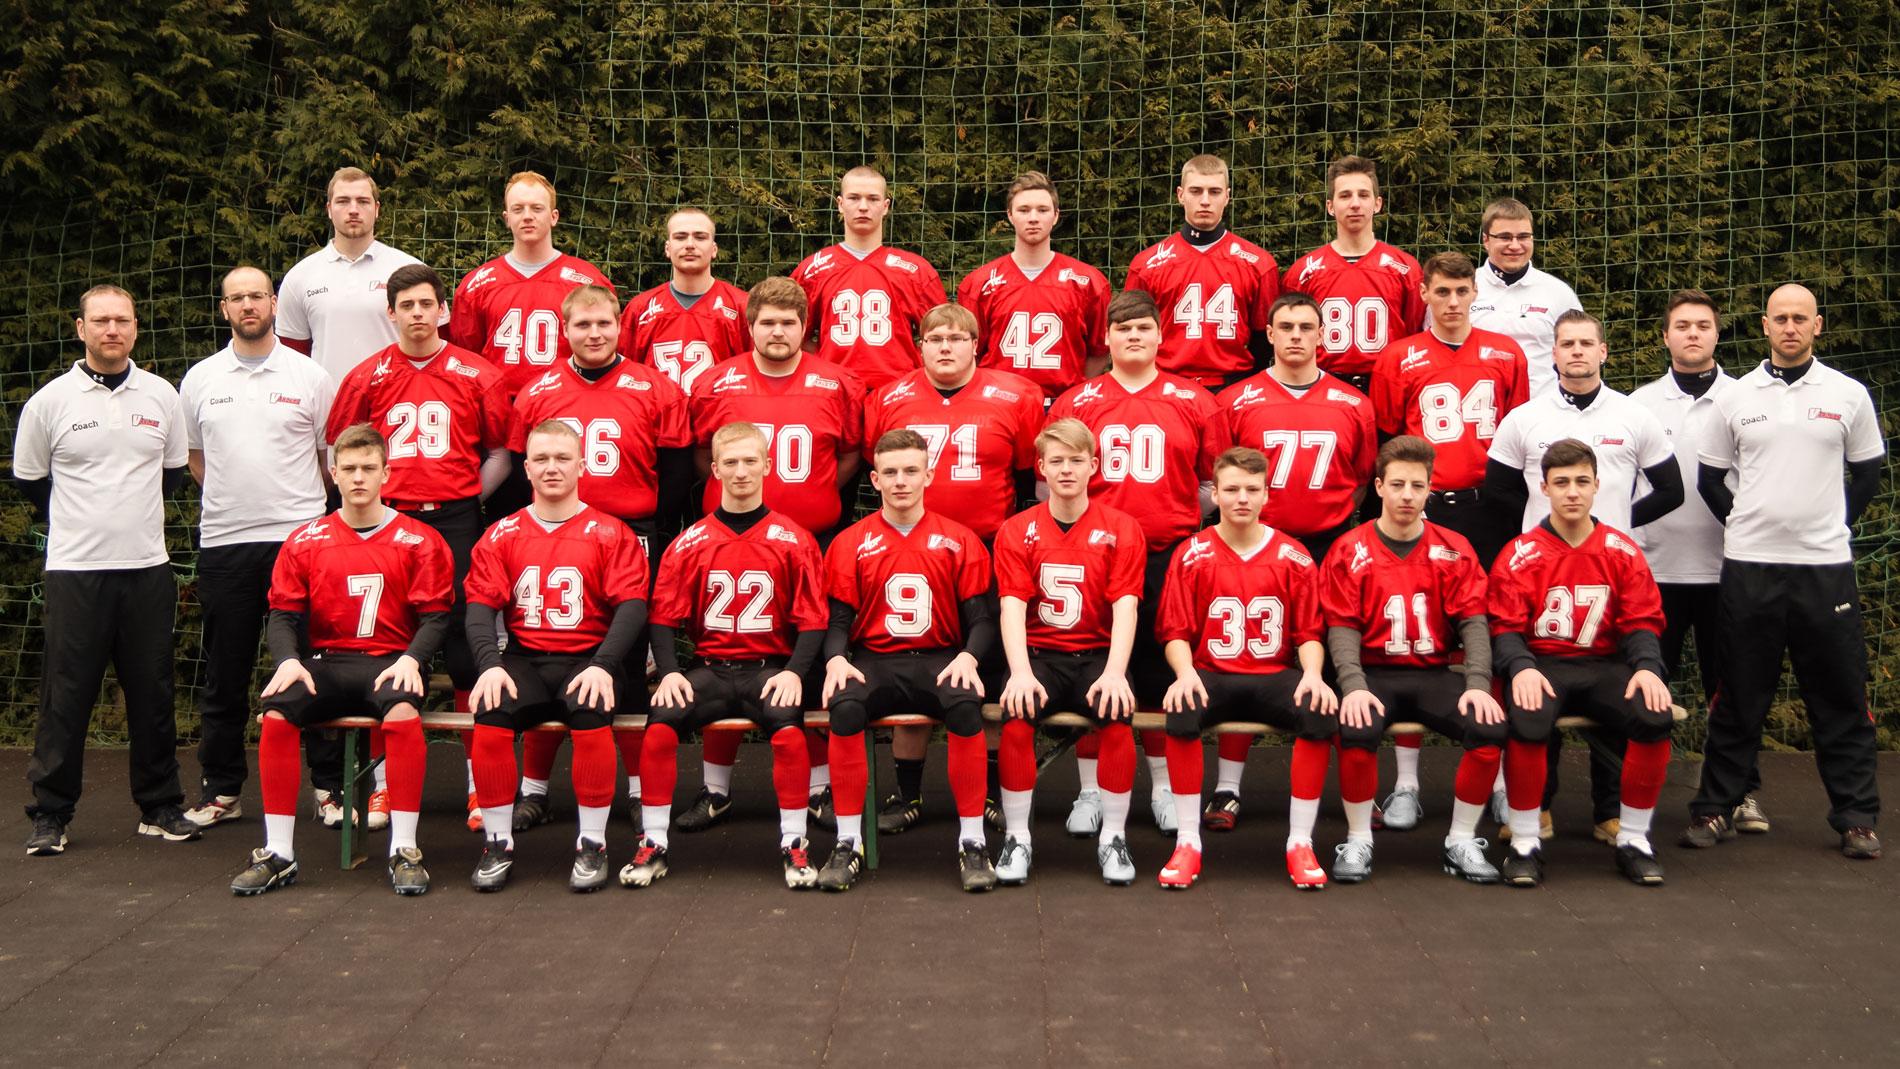 Teamfoto Varlets 2015